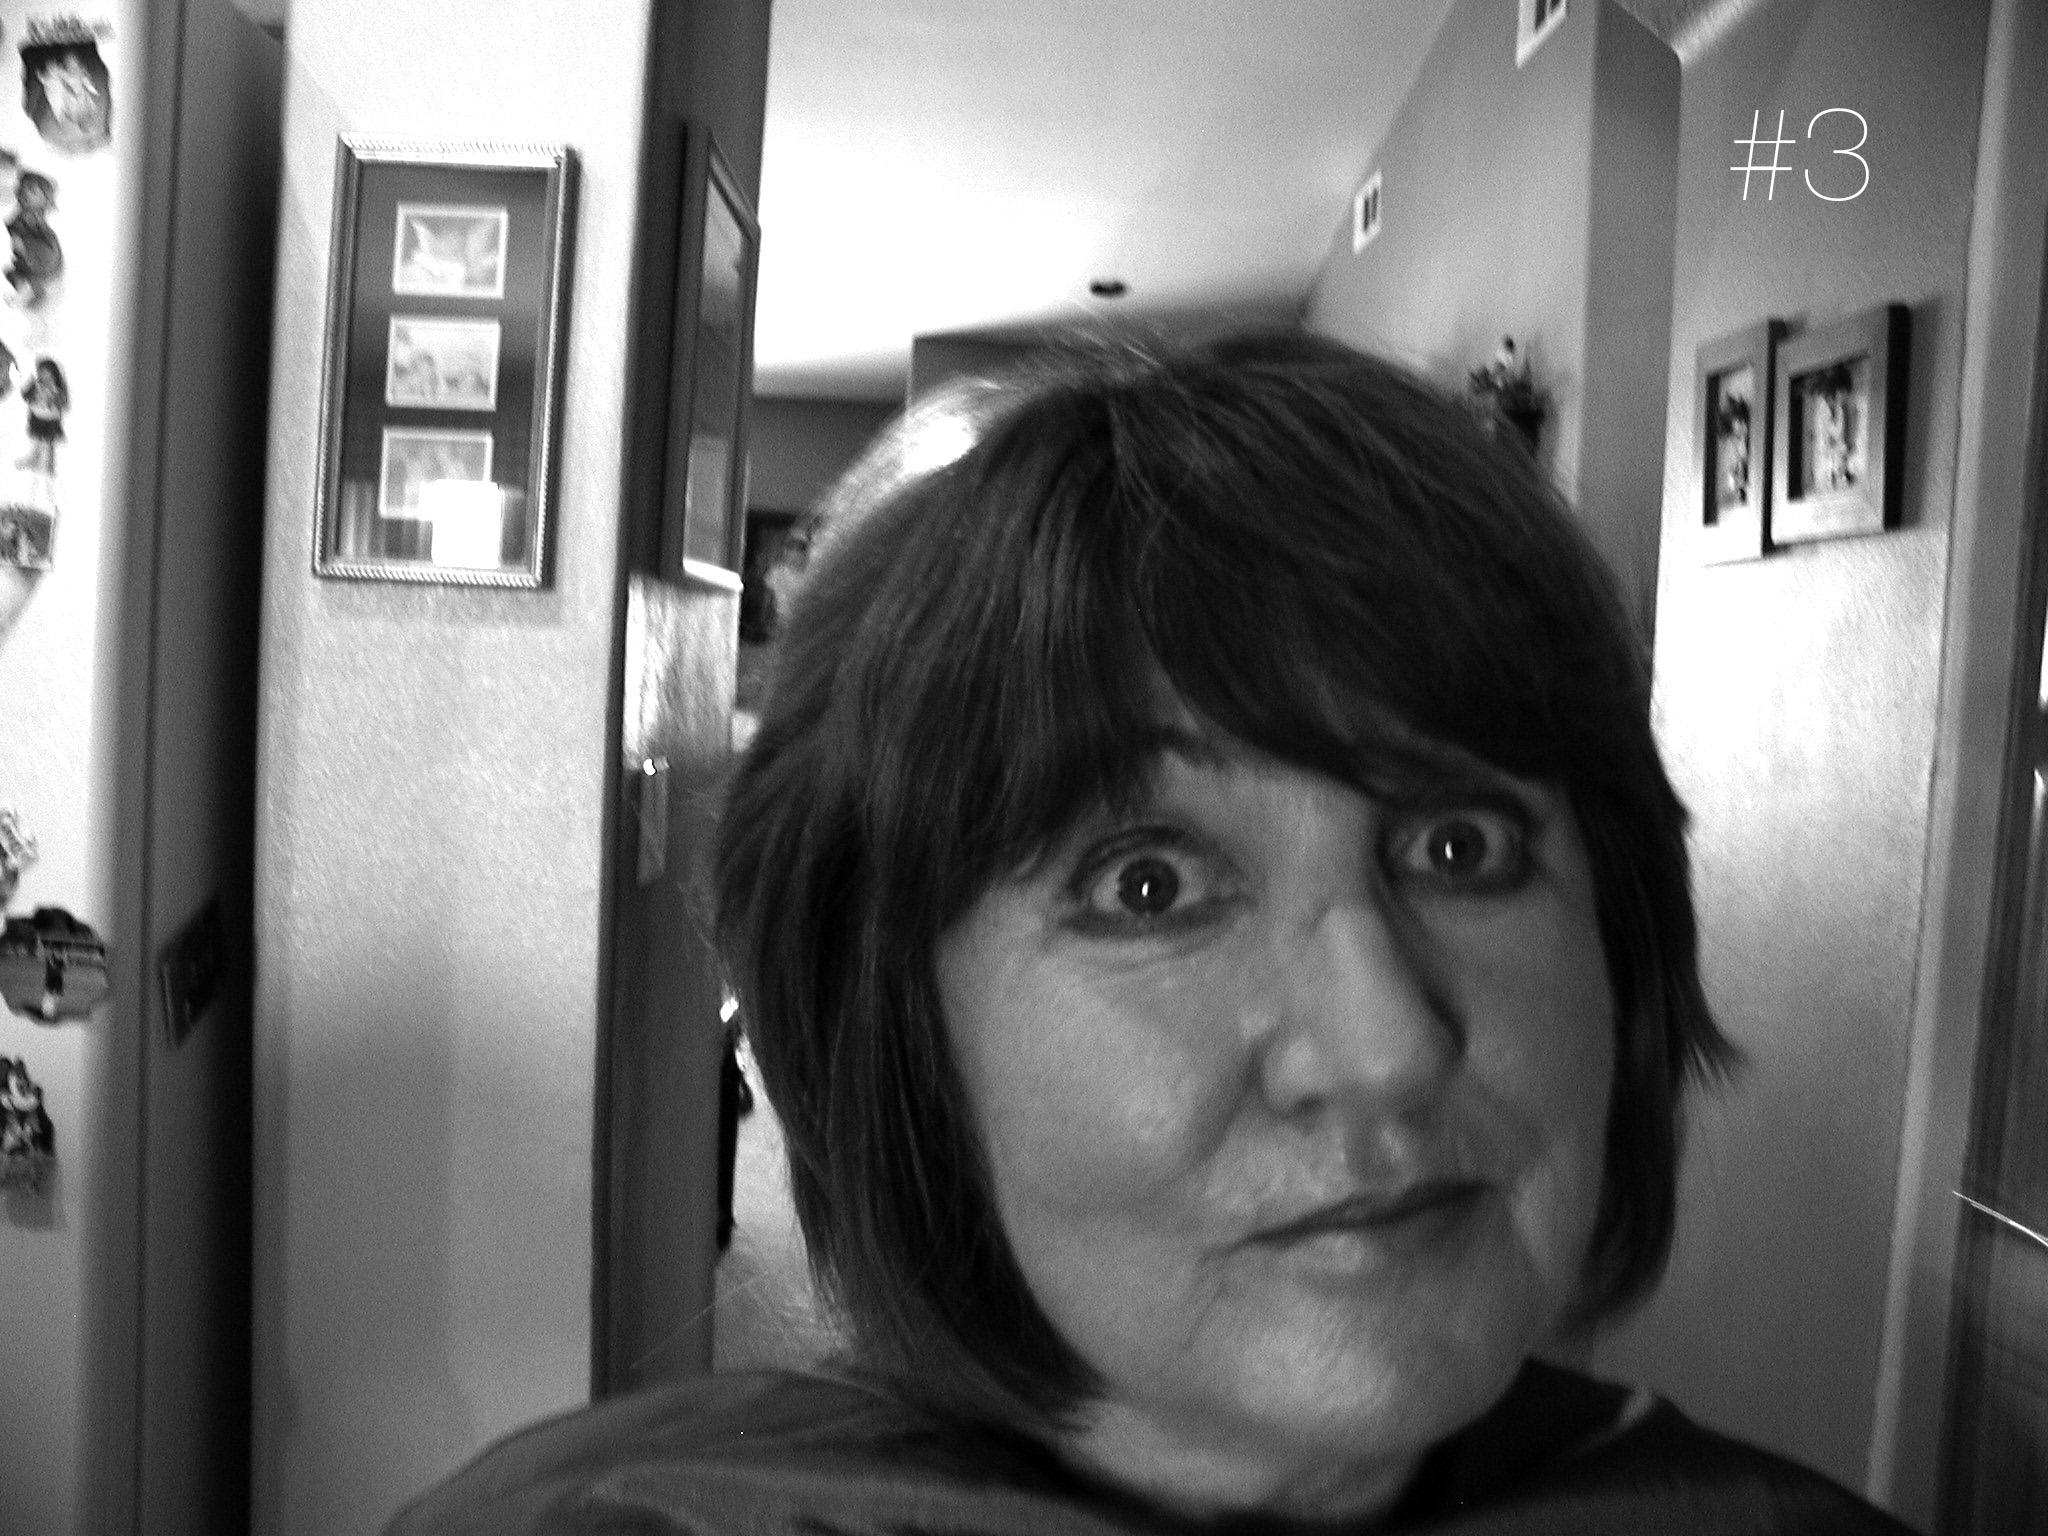 Murrieta Hot Springs, CA. Mi Mamacita. 2008